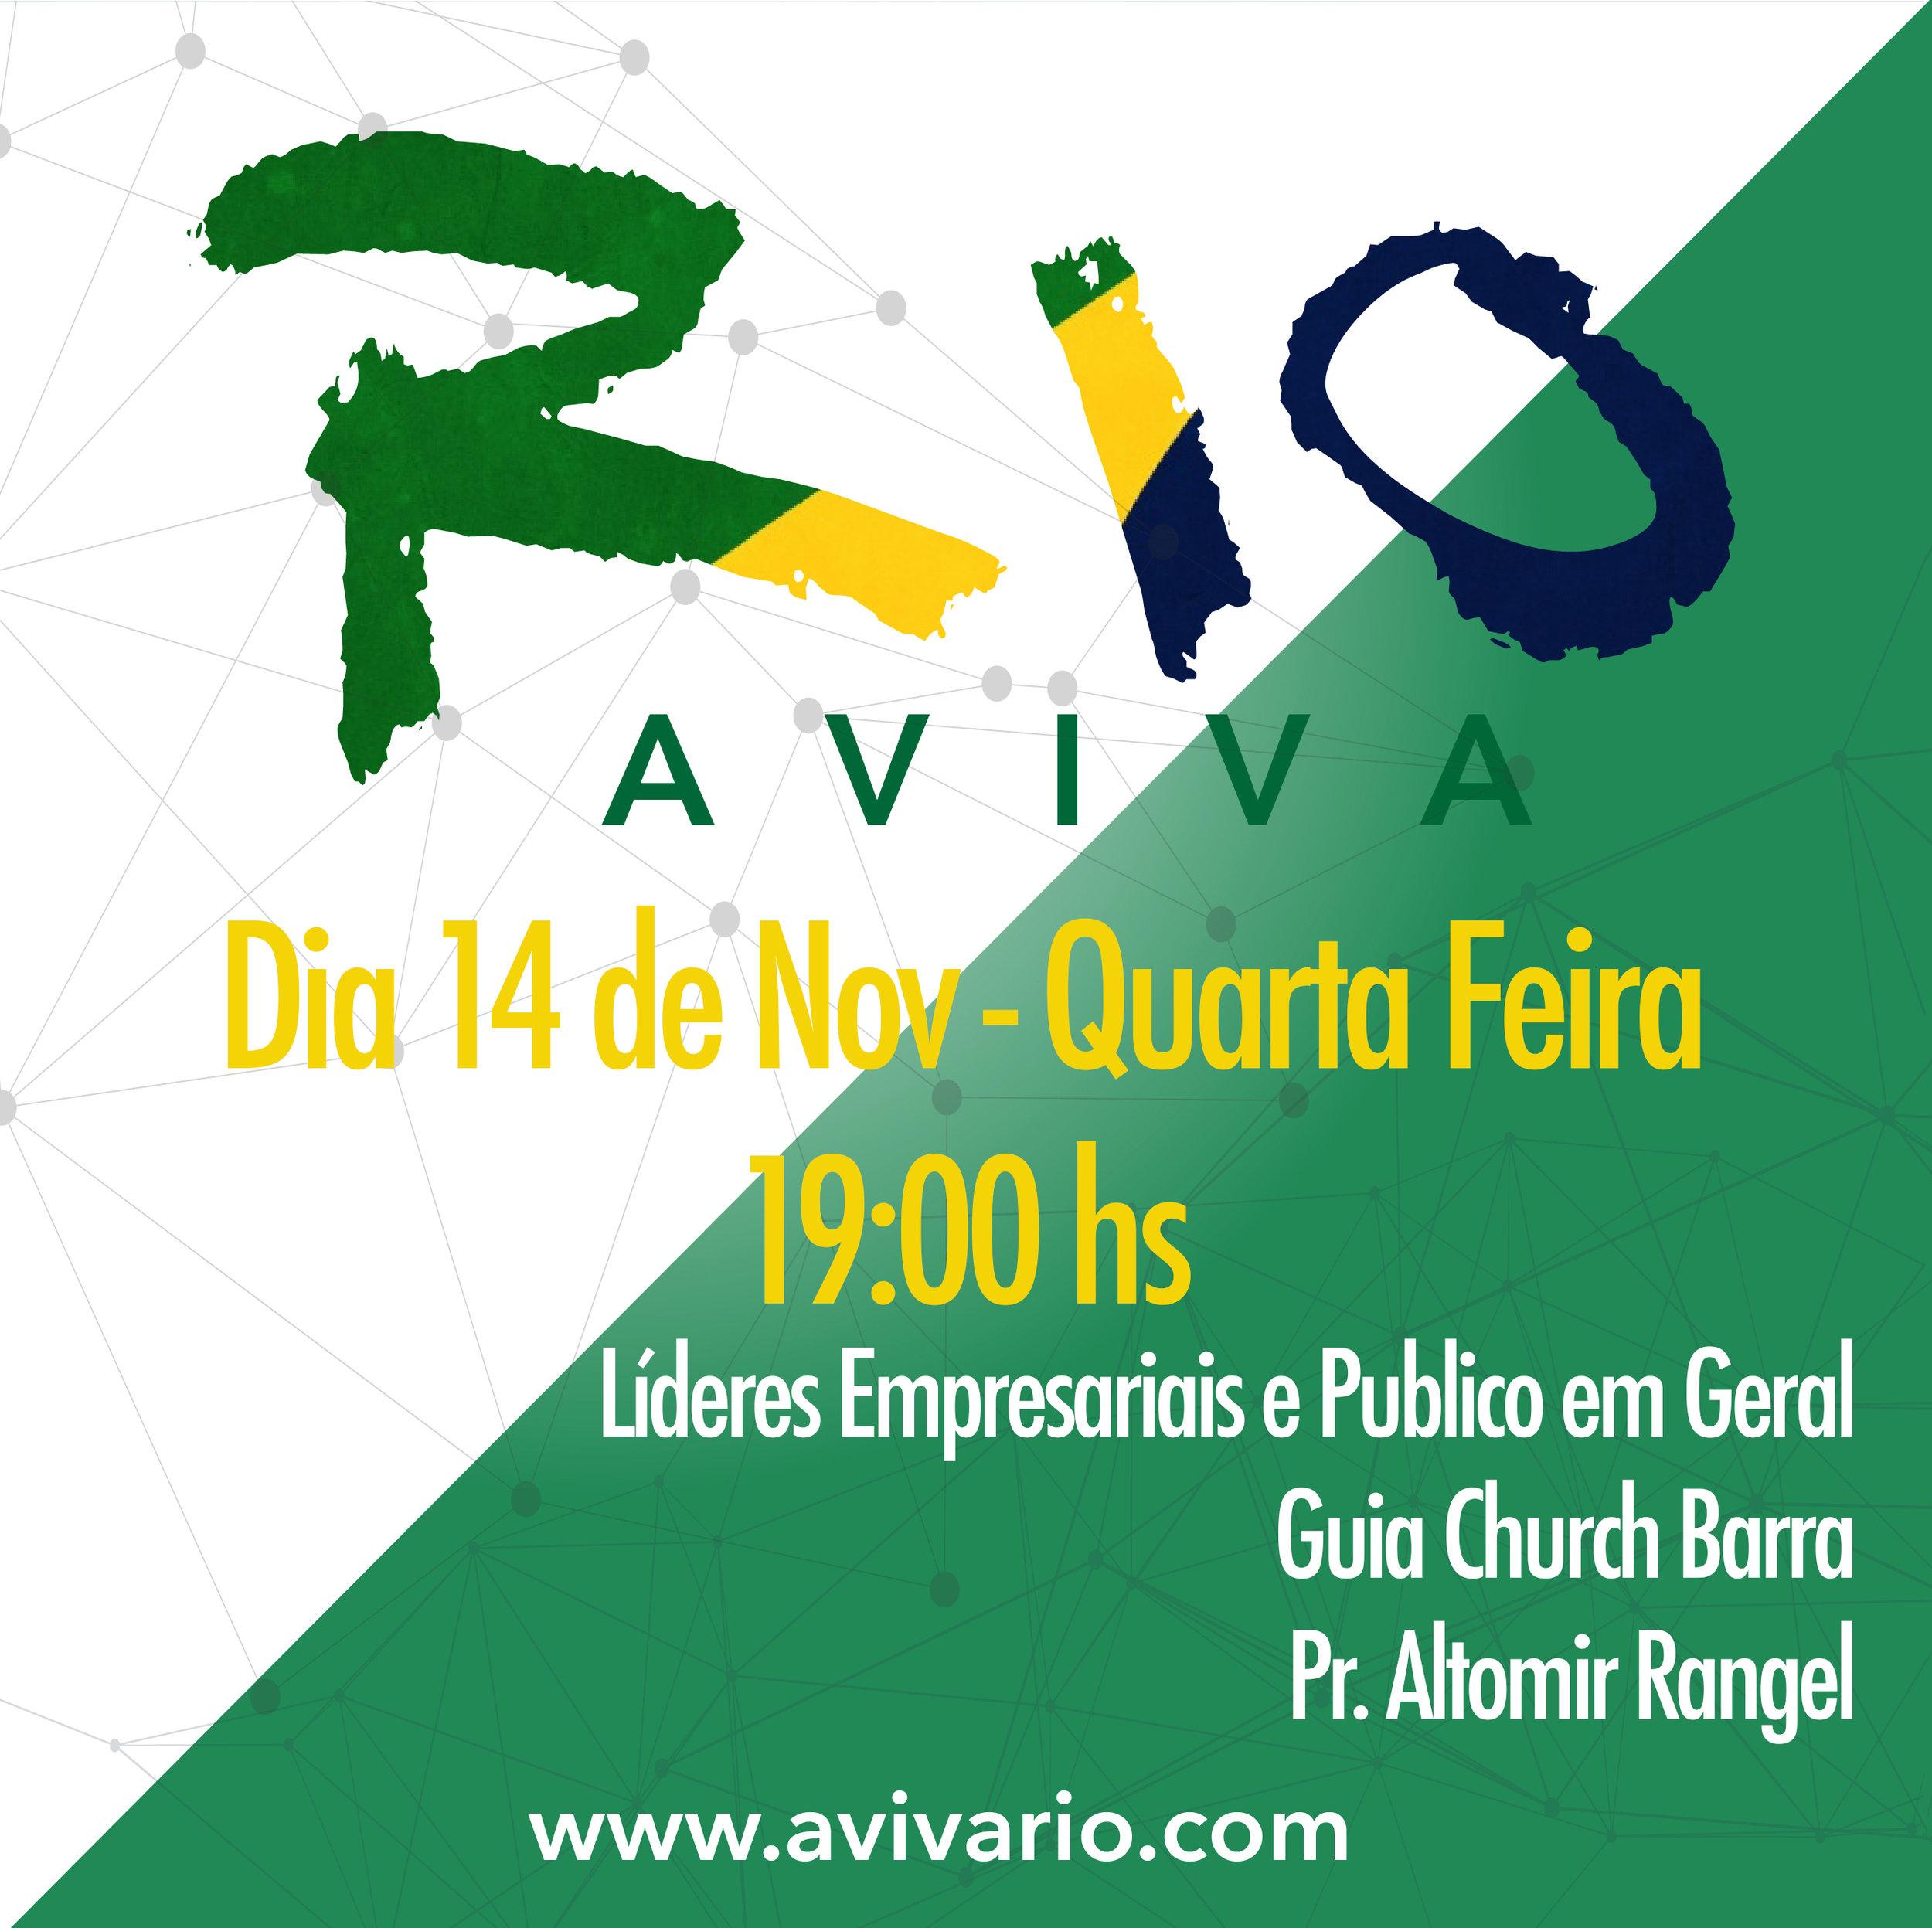 RioRevived-Wednesday-IG-Portuguese-2.jpg